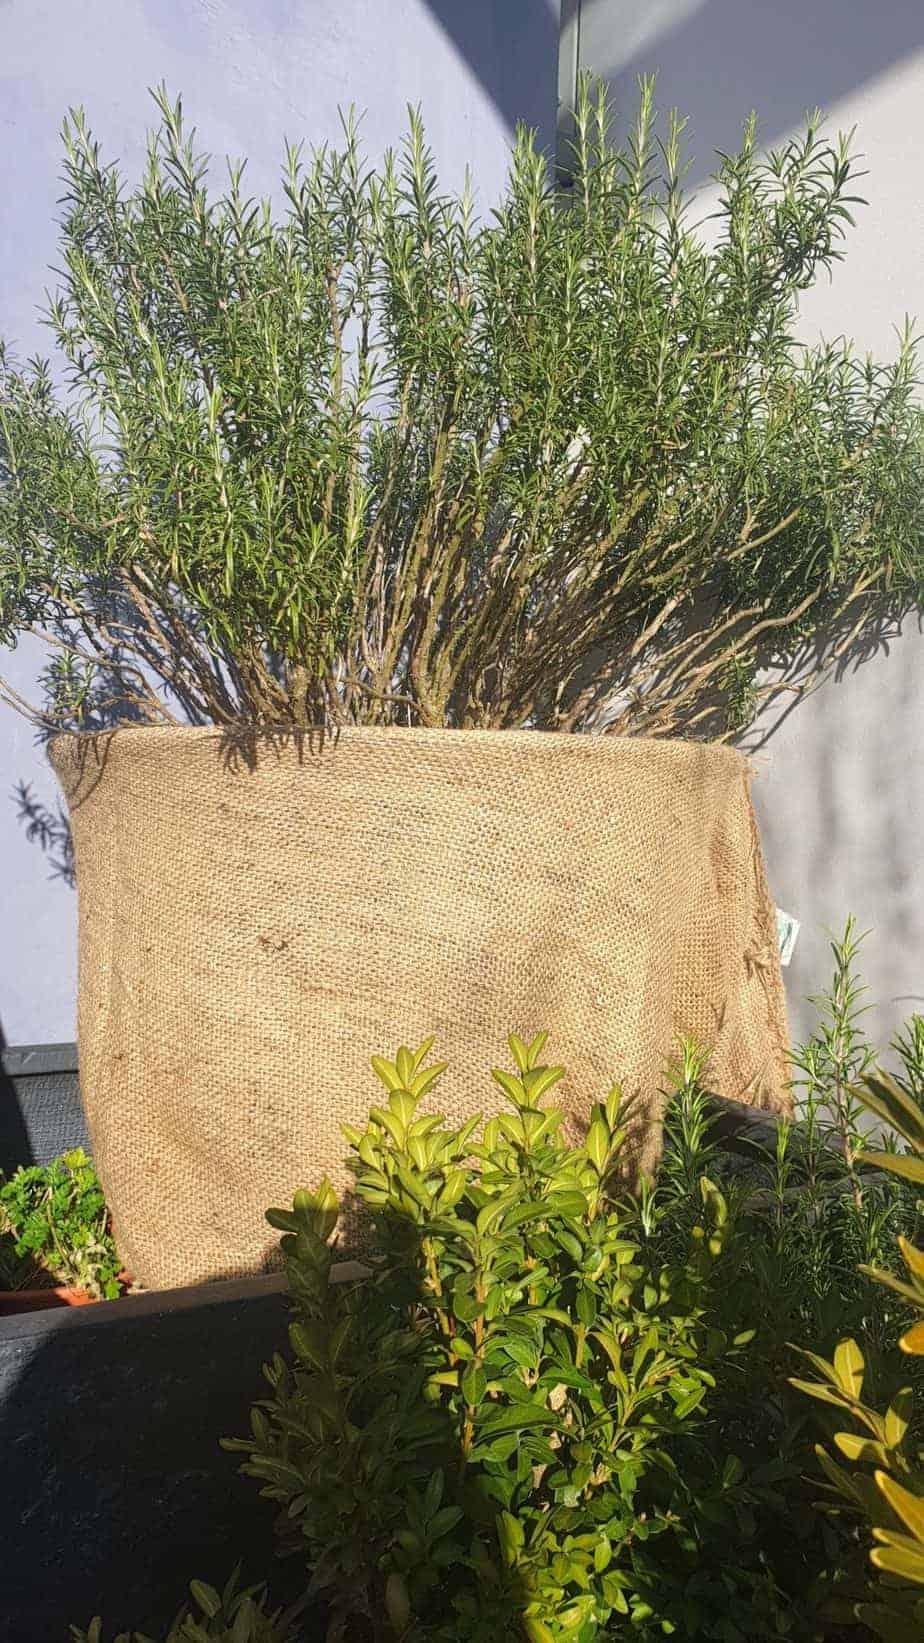 Rosmarinpflanze überwintert im Jutesack